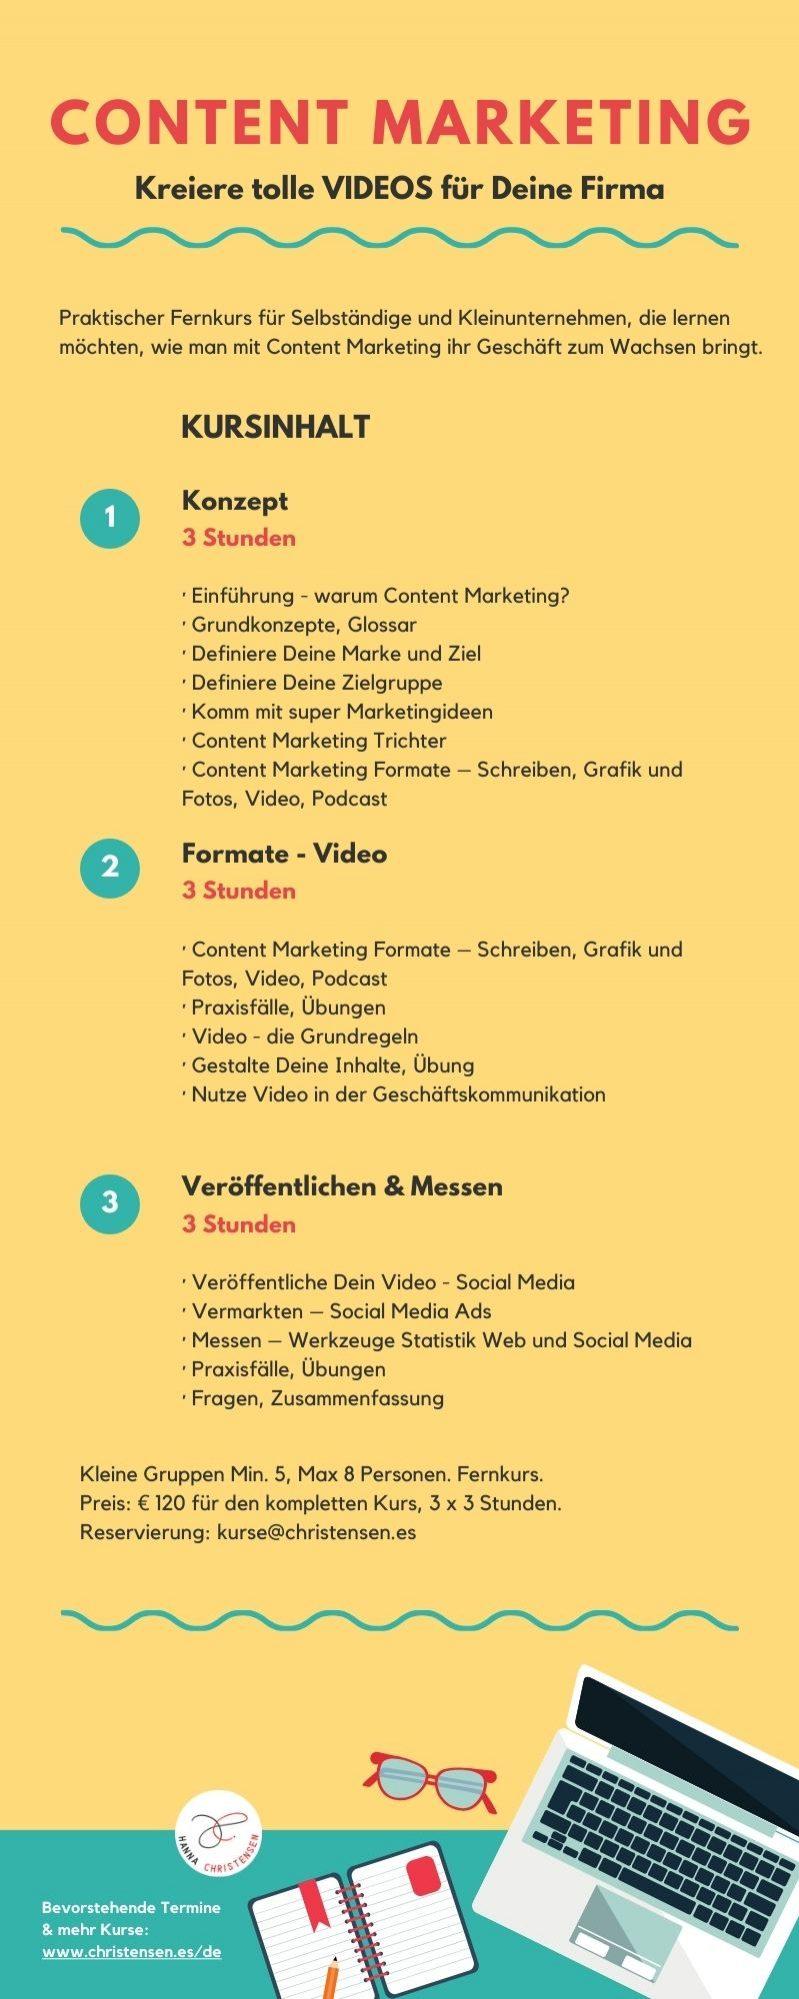 content-marketing-infografic-DE